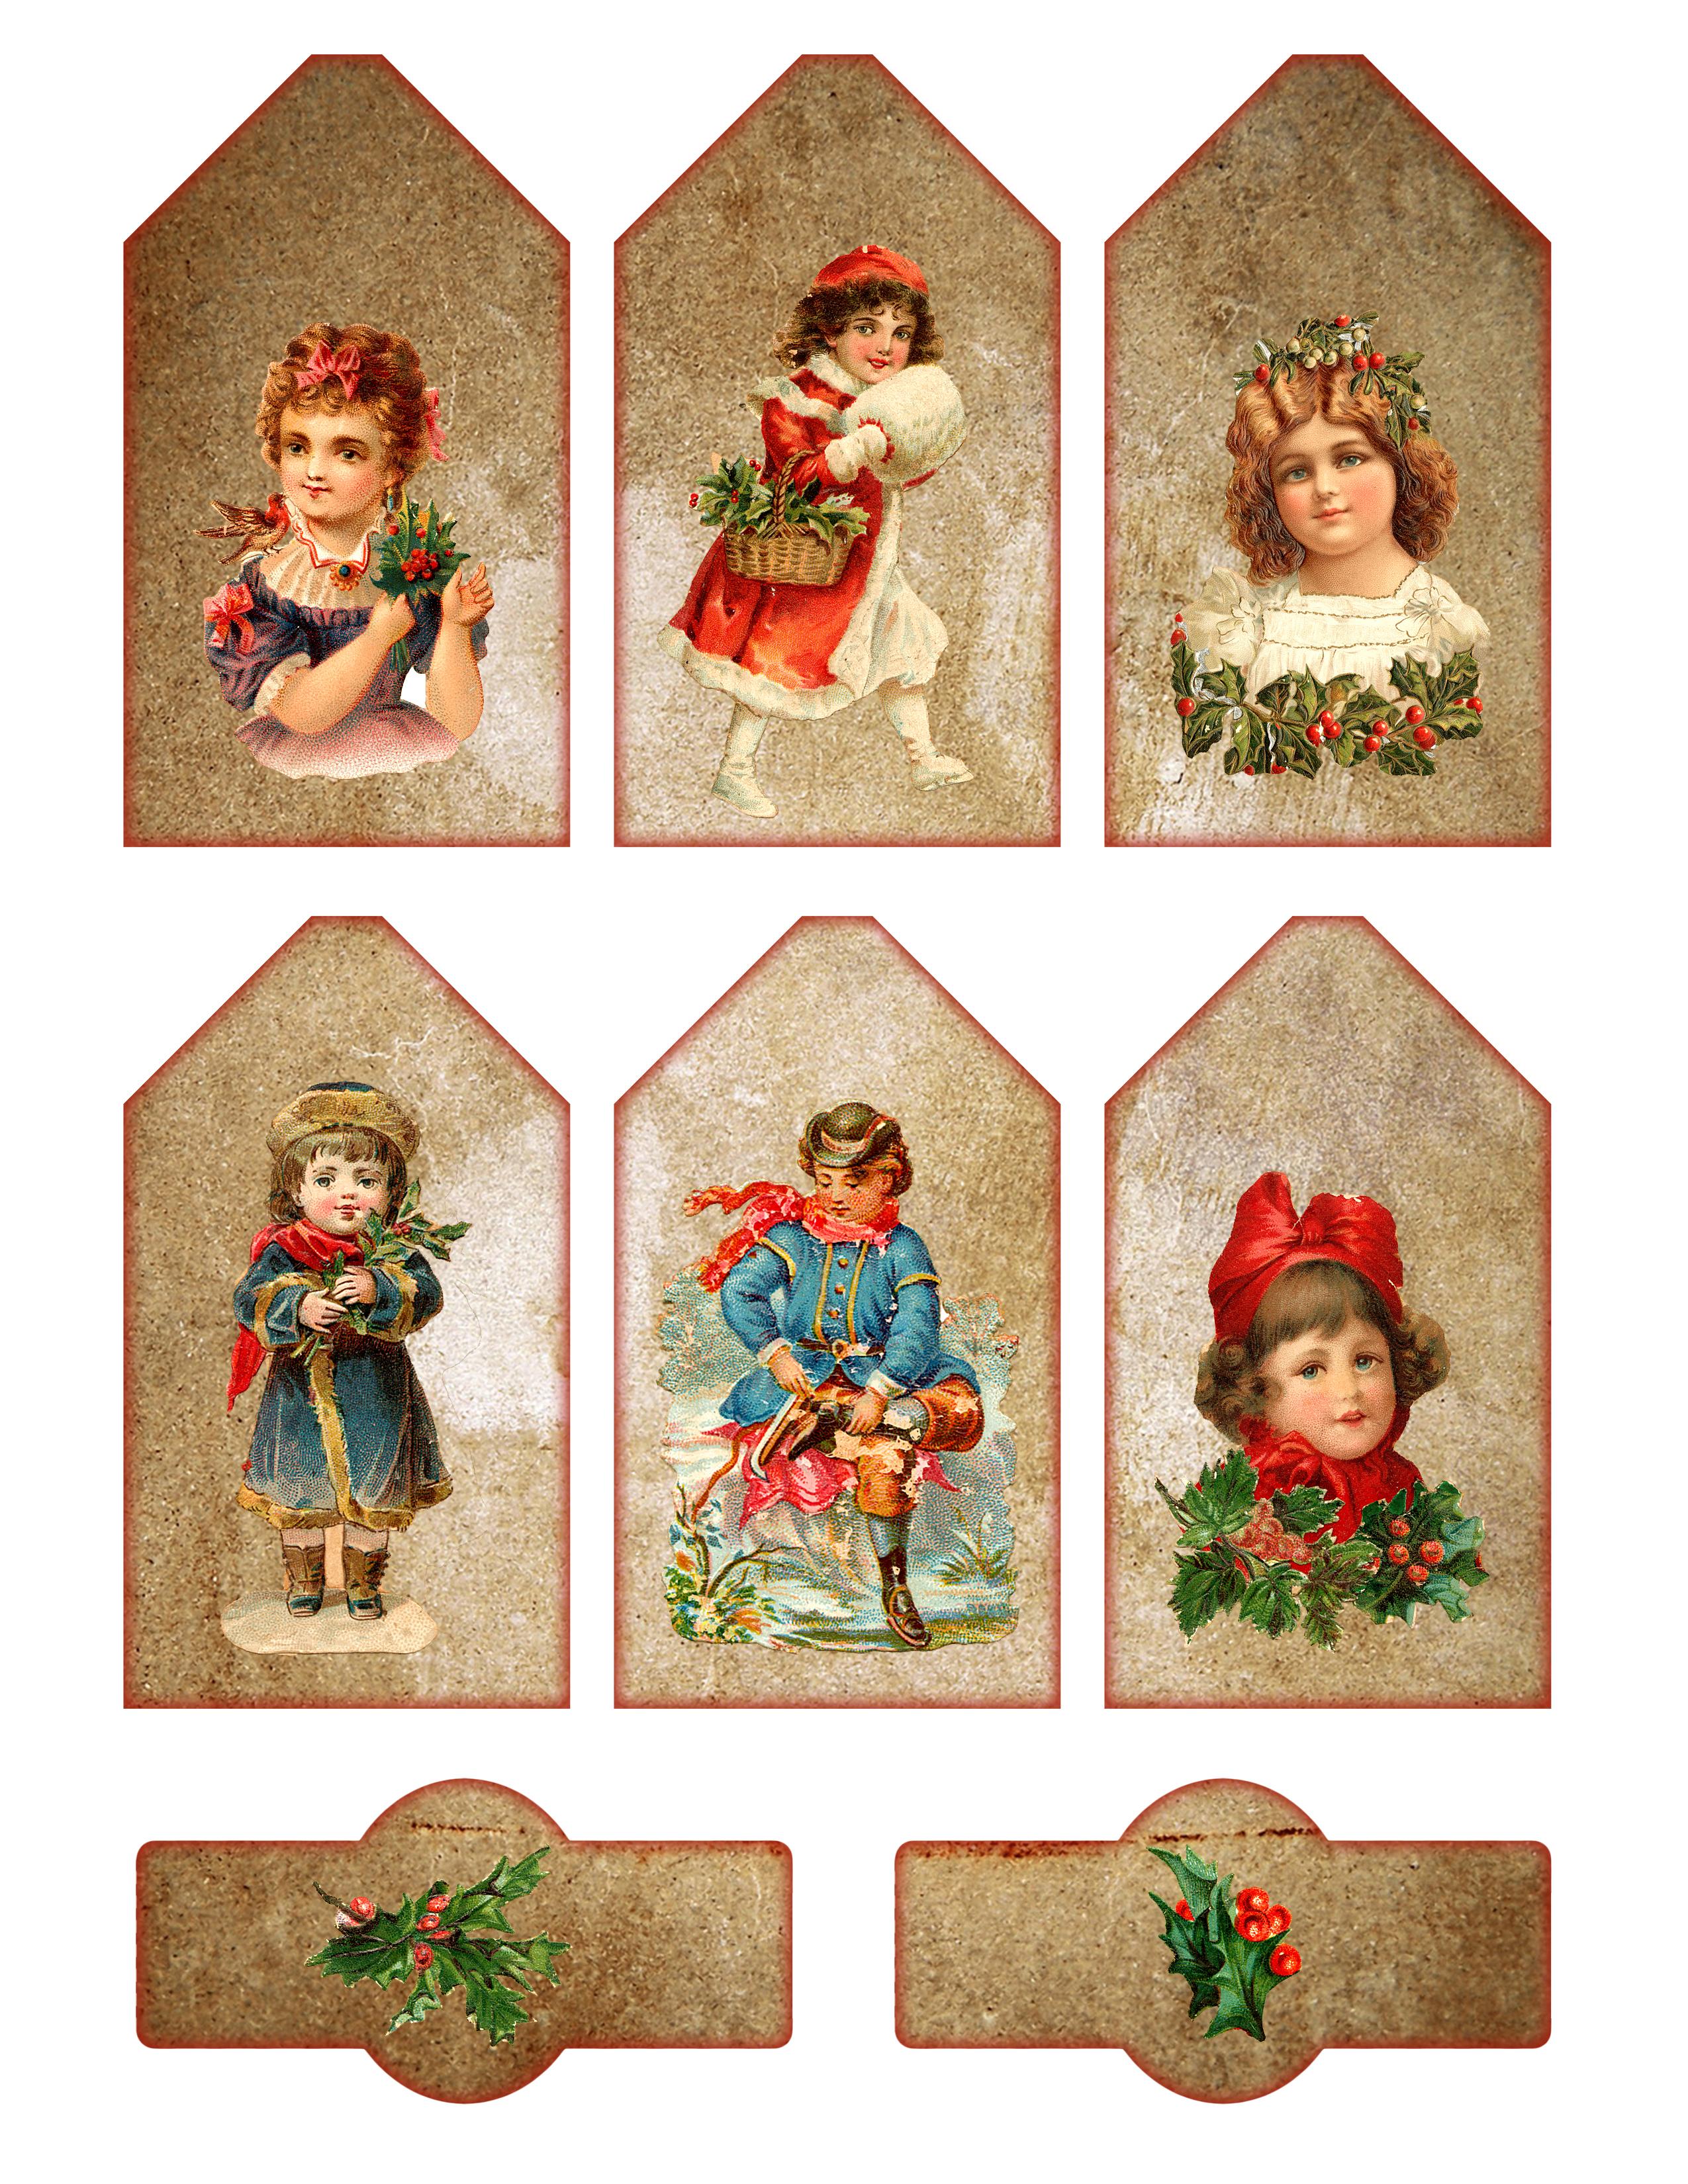 Vintage Printable Christmas Tags And Labels - The Graffical Muse - Free Printable Christmas Photo Collage